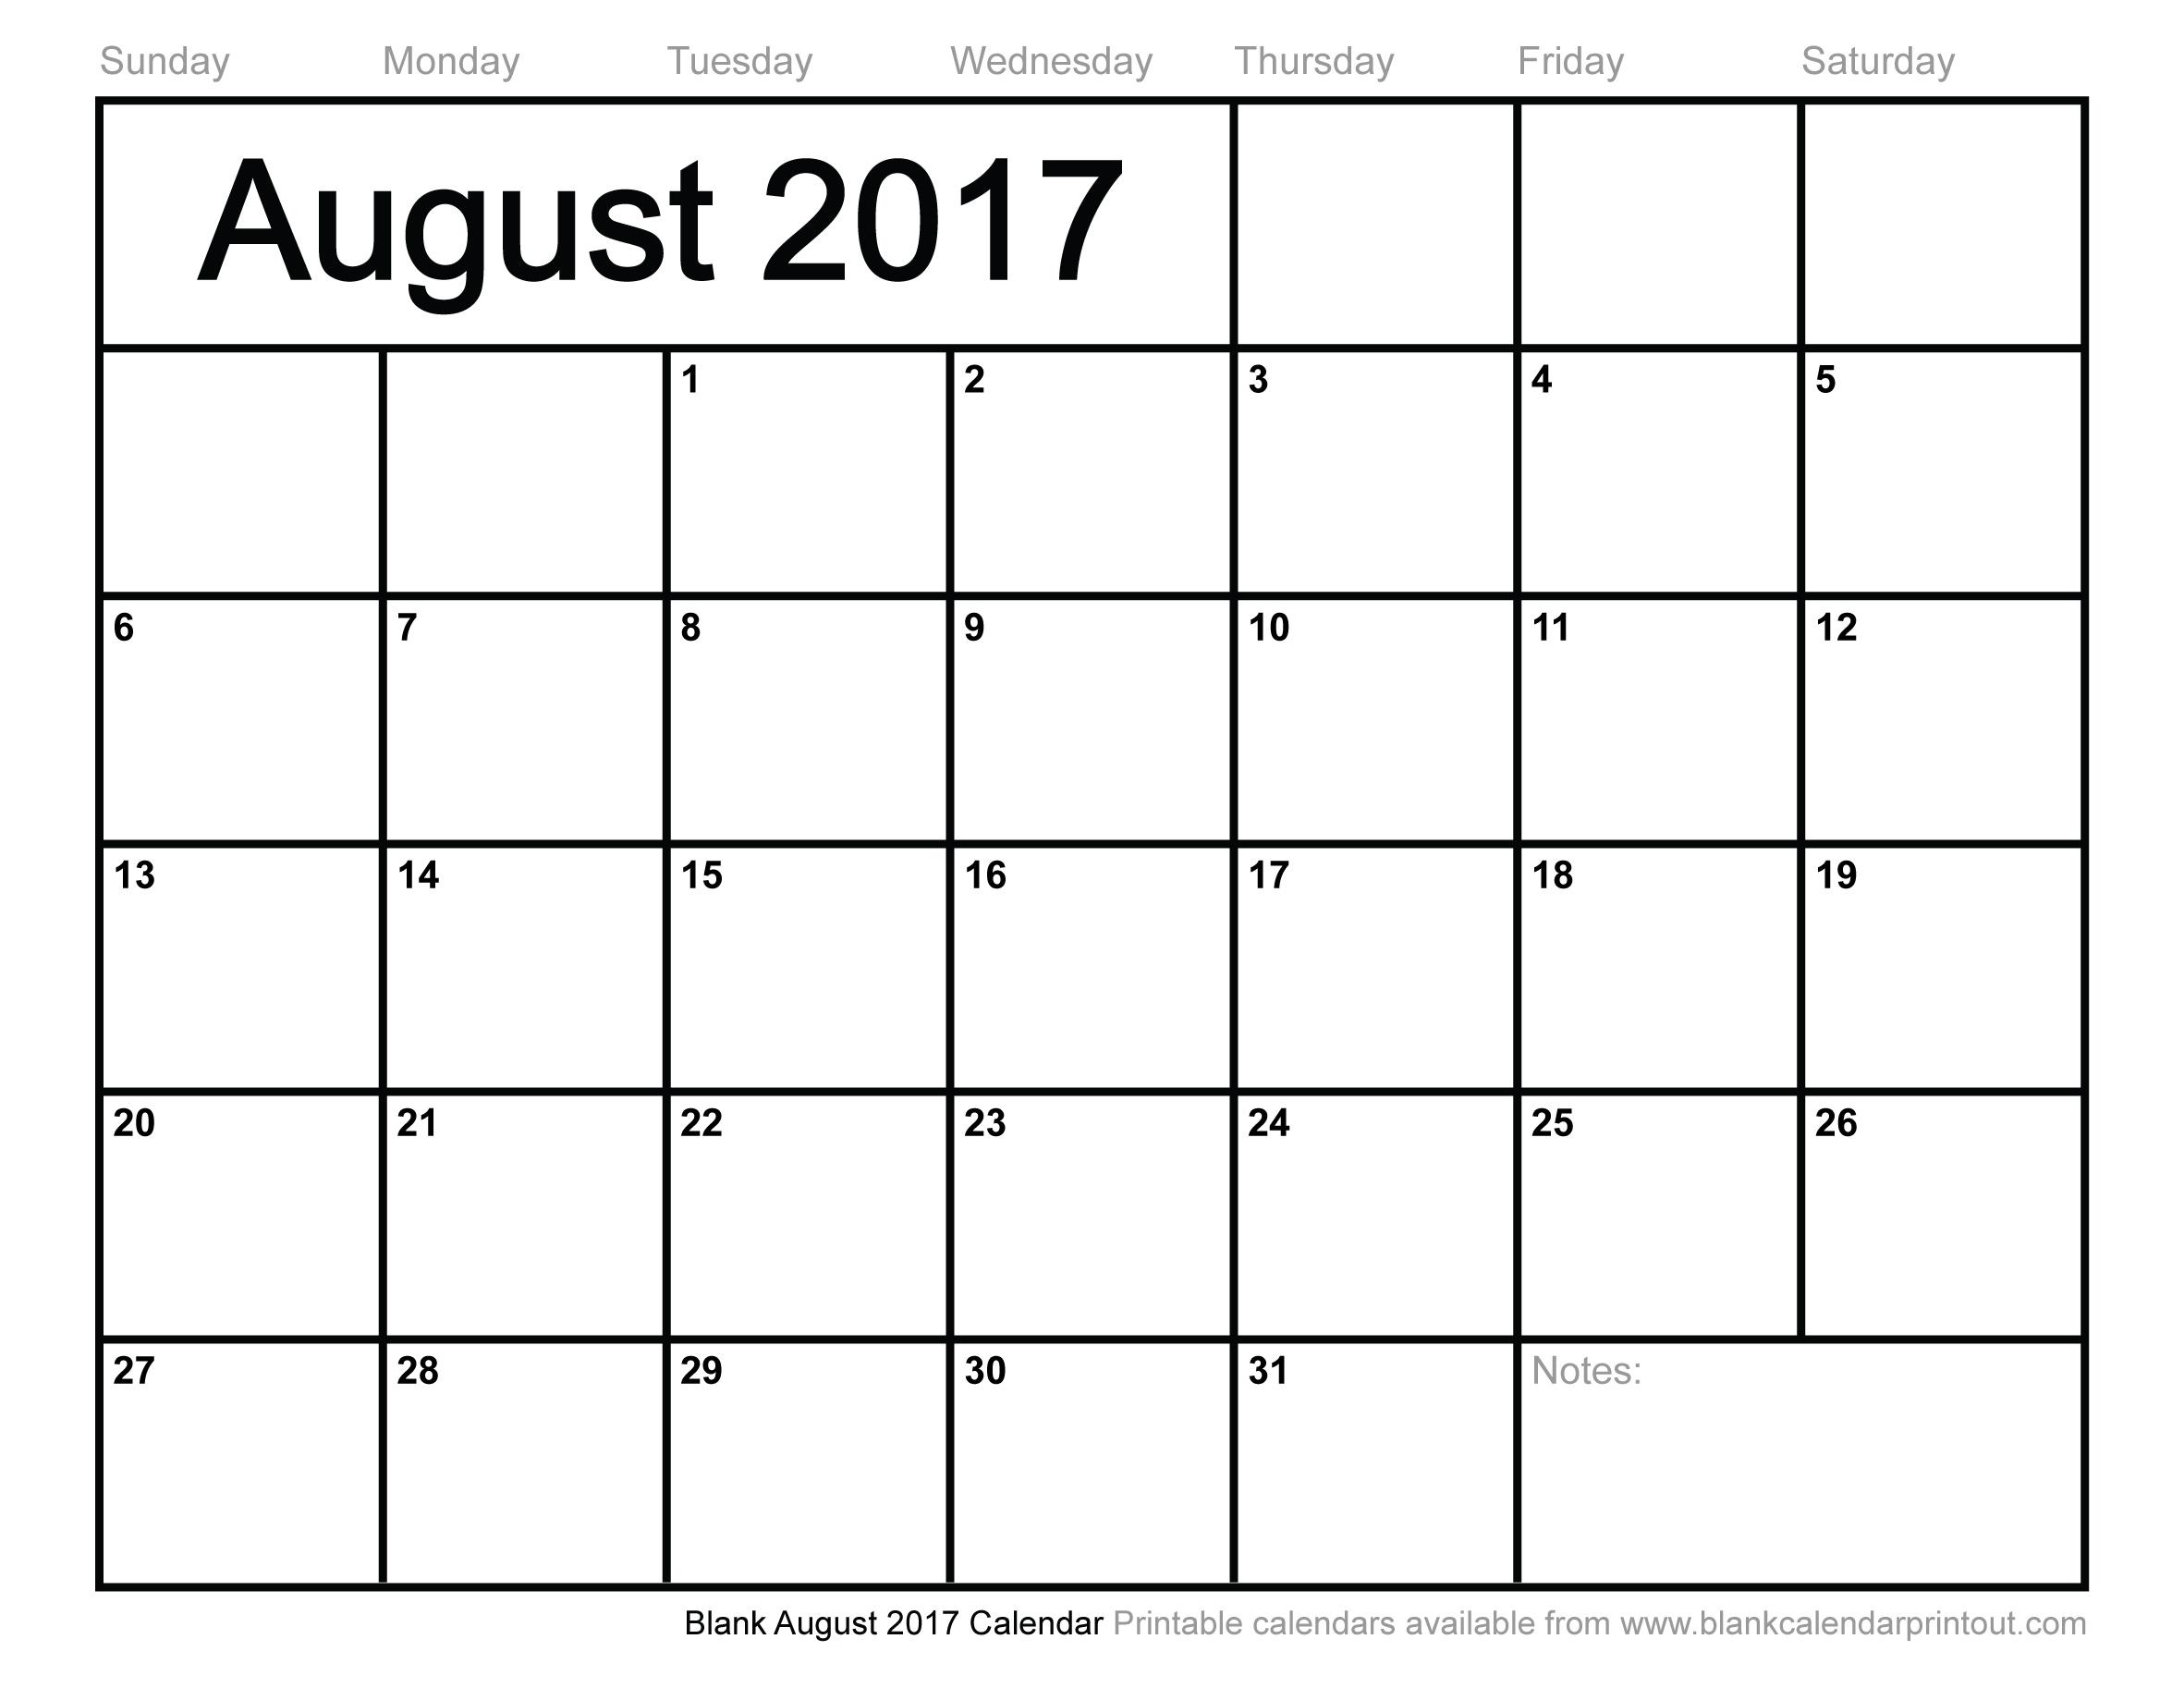 Blank August 2017 Calendar To Print